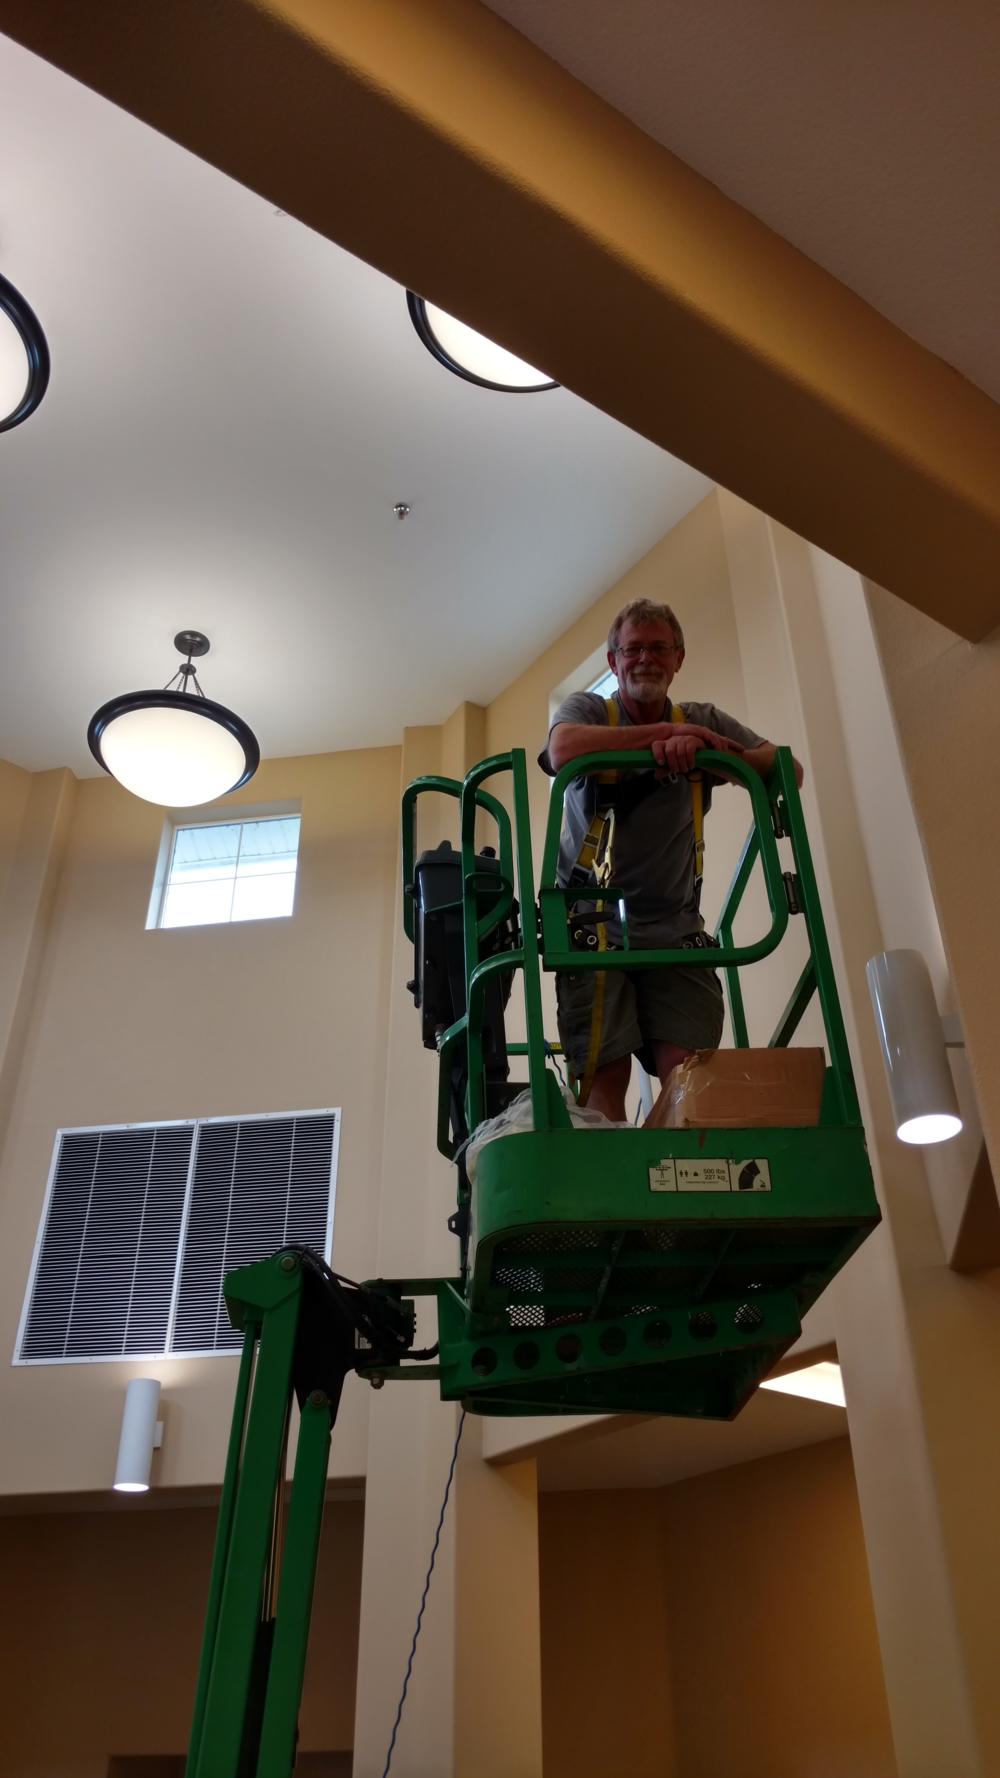 Senior Care Communities, Commercial Pendant Lighting Maintenance